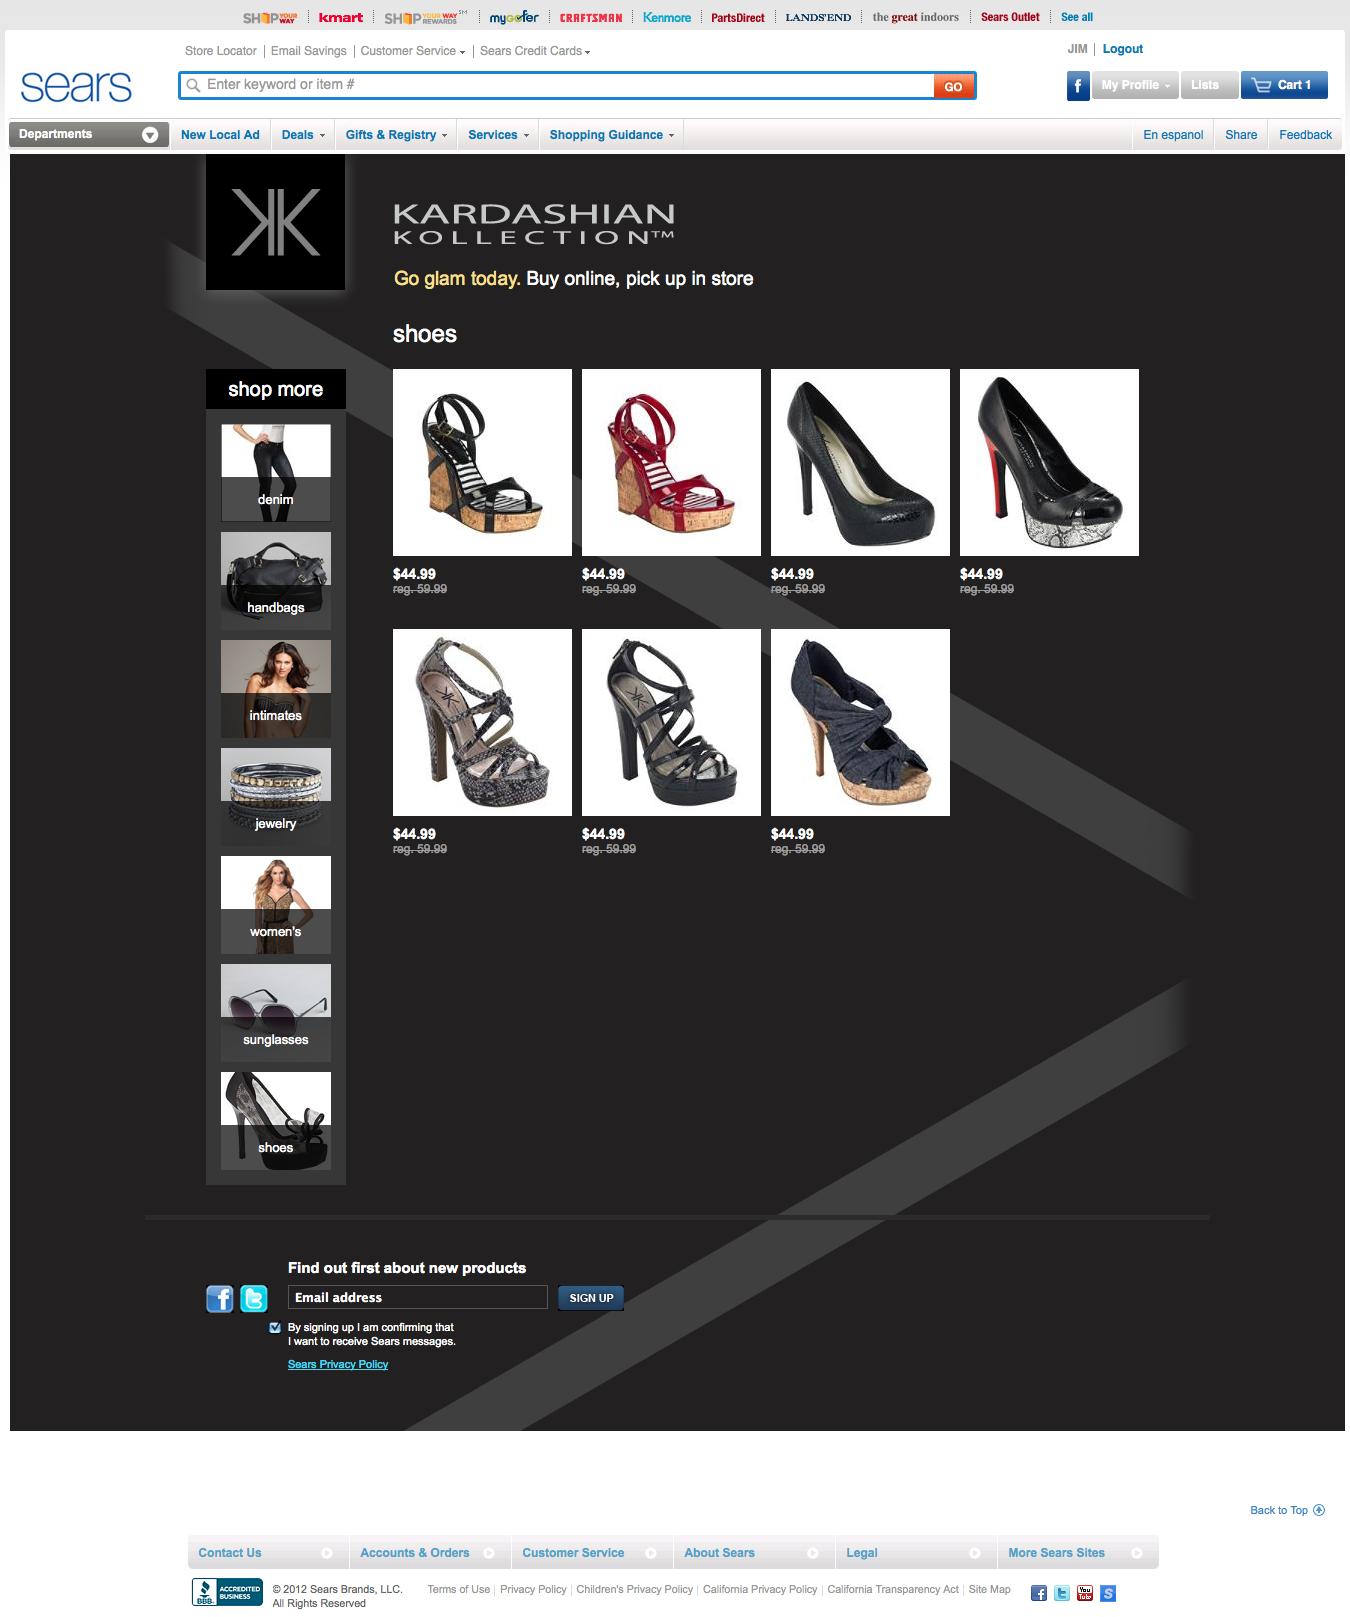 Kardashian Kollection Department Page